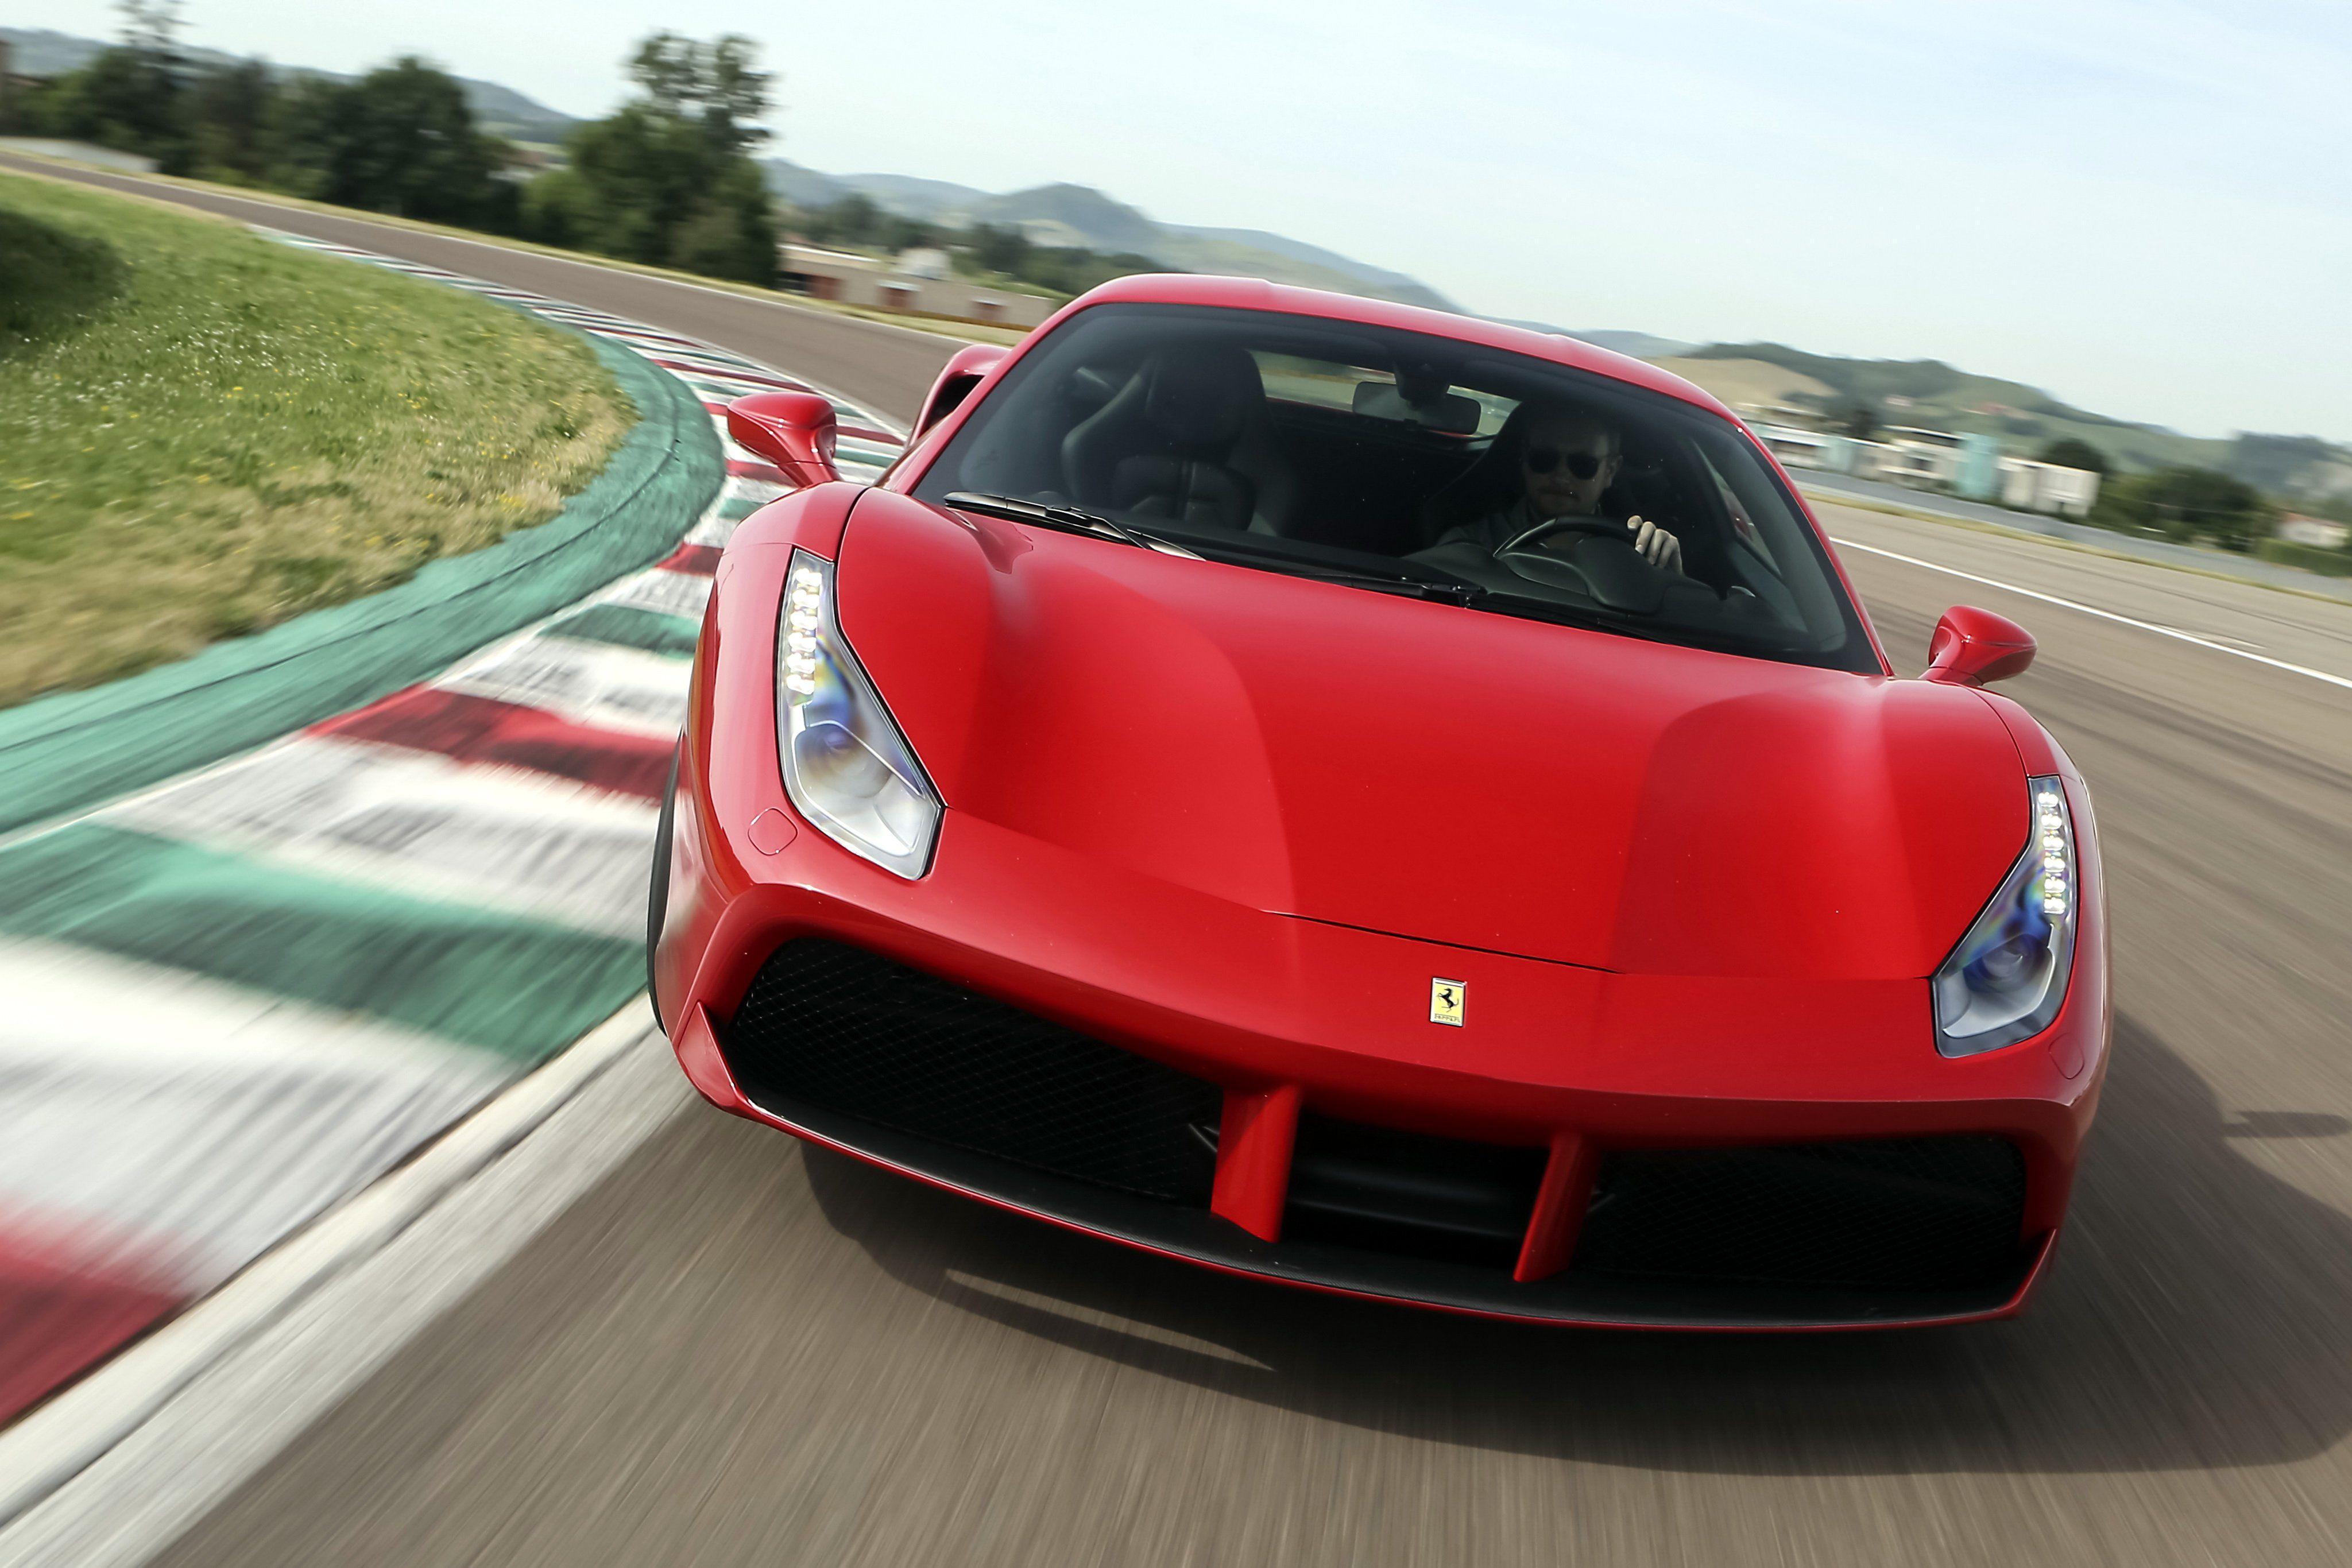 Ferrari GTB ANDROID LIVE WALLPAPER FREE NO ADs YouTube